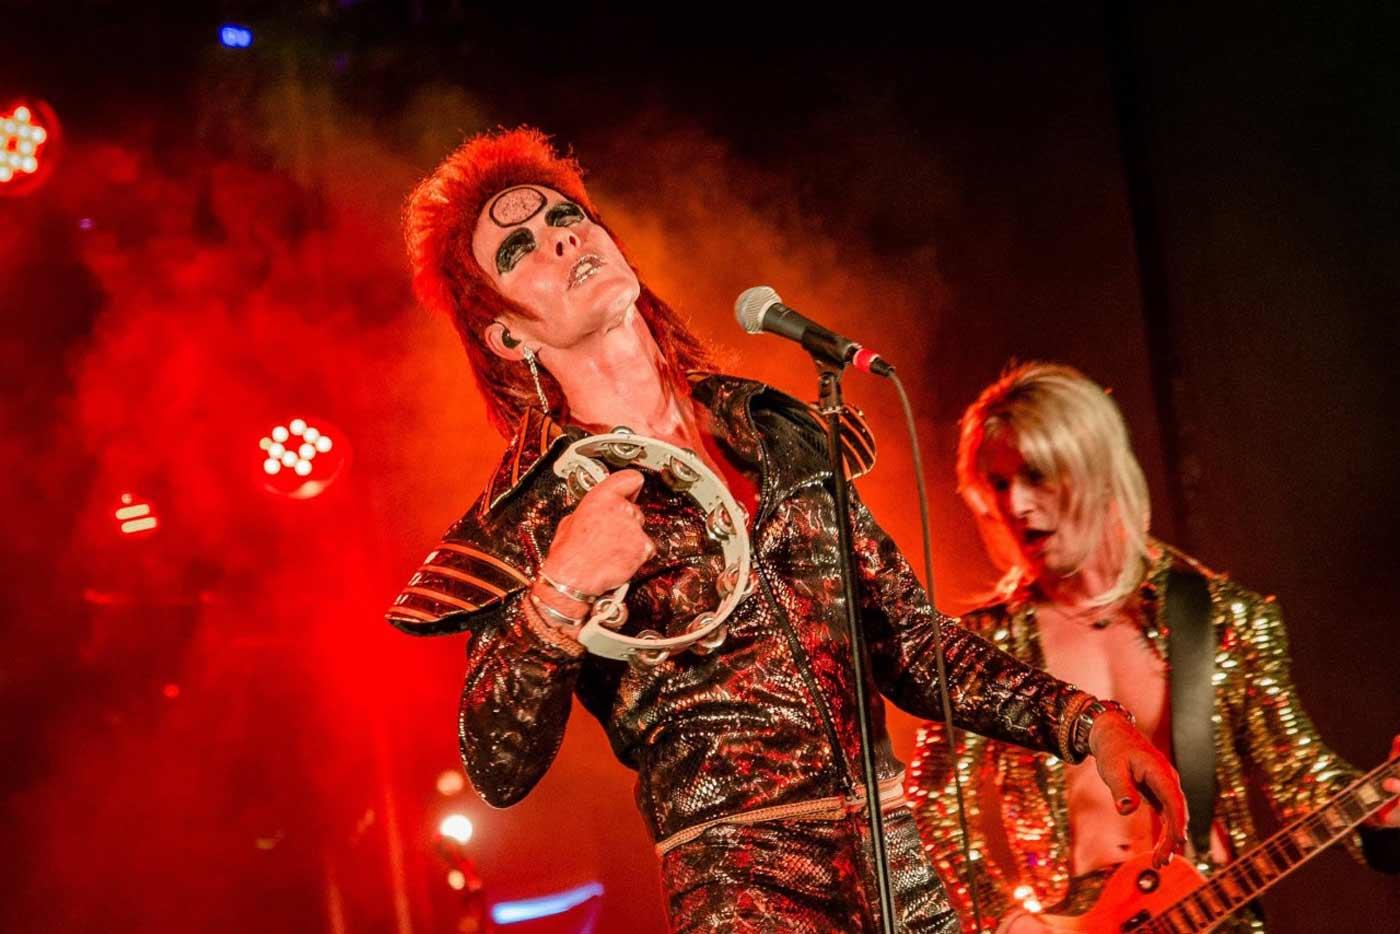 Absolute Bowie llega a Barcelona el 14 de septiembre